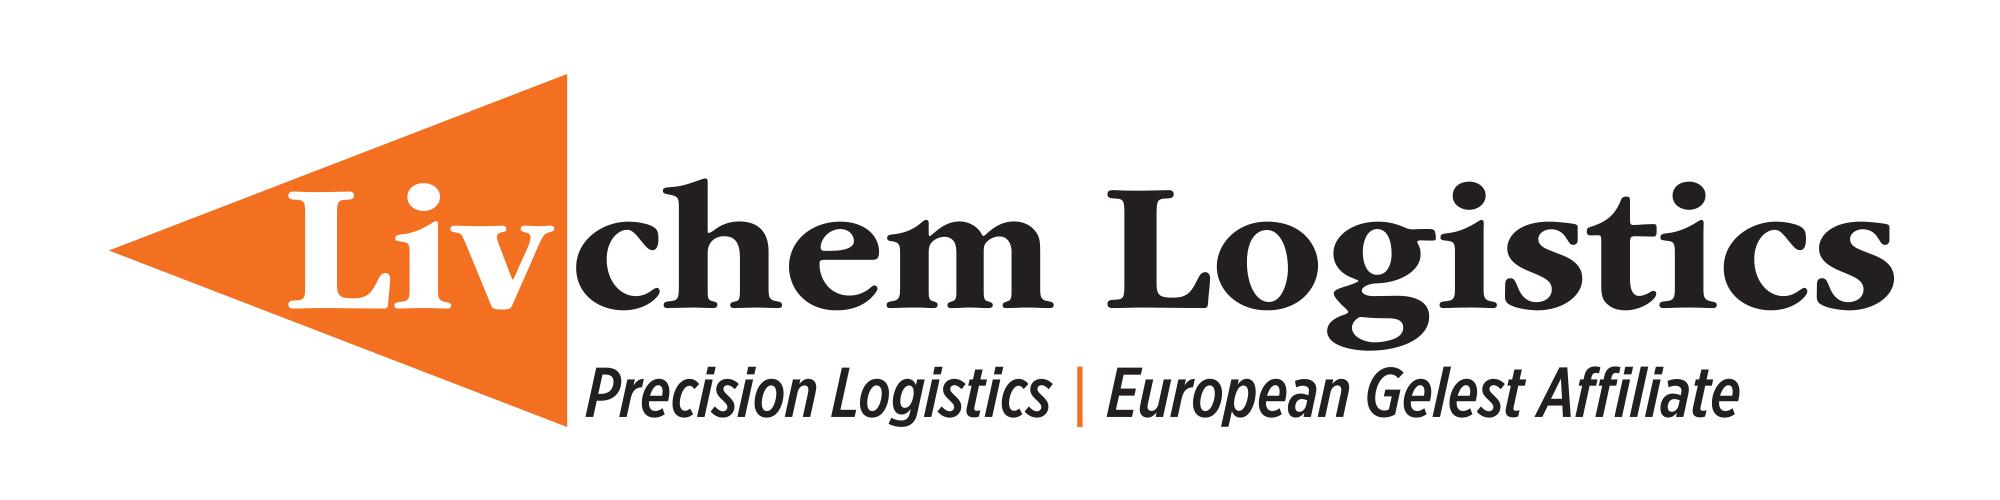 Livchem Logistics